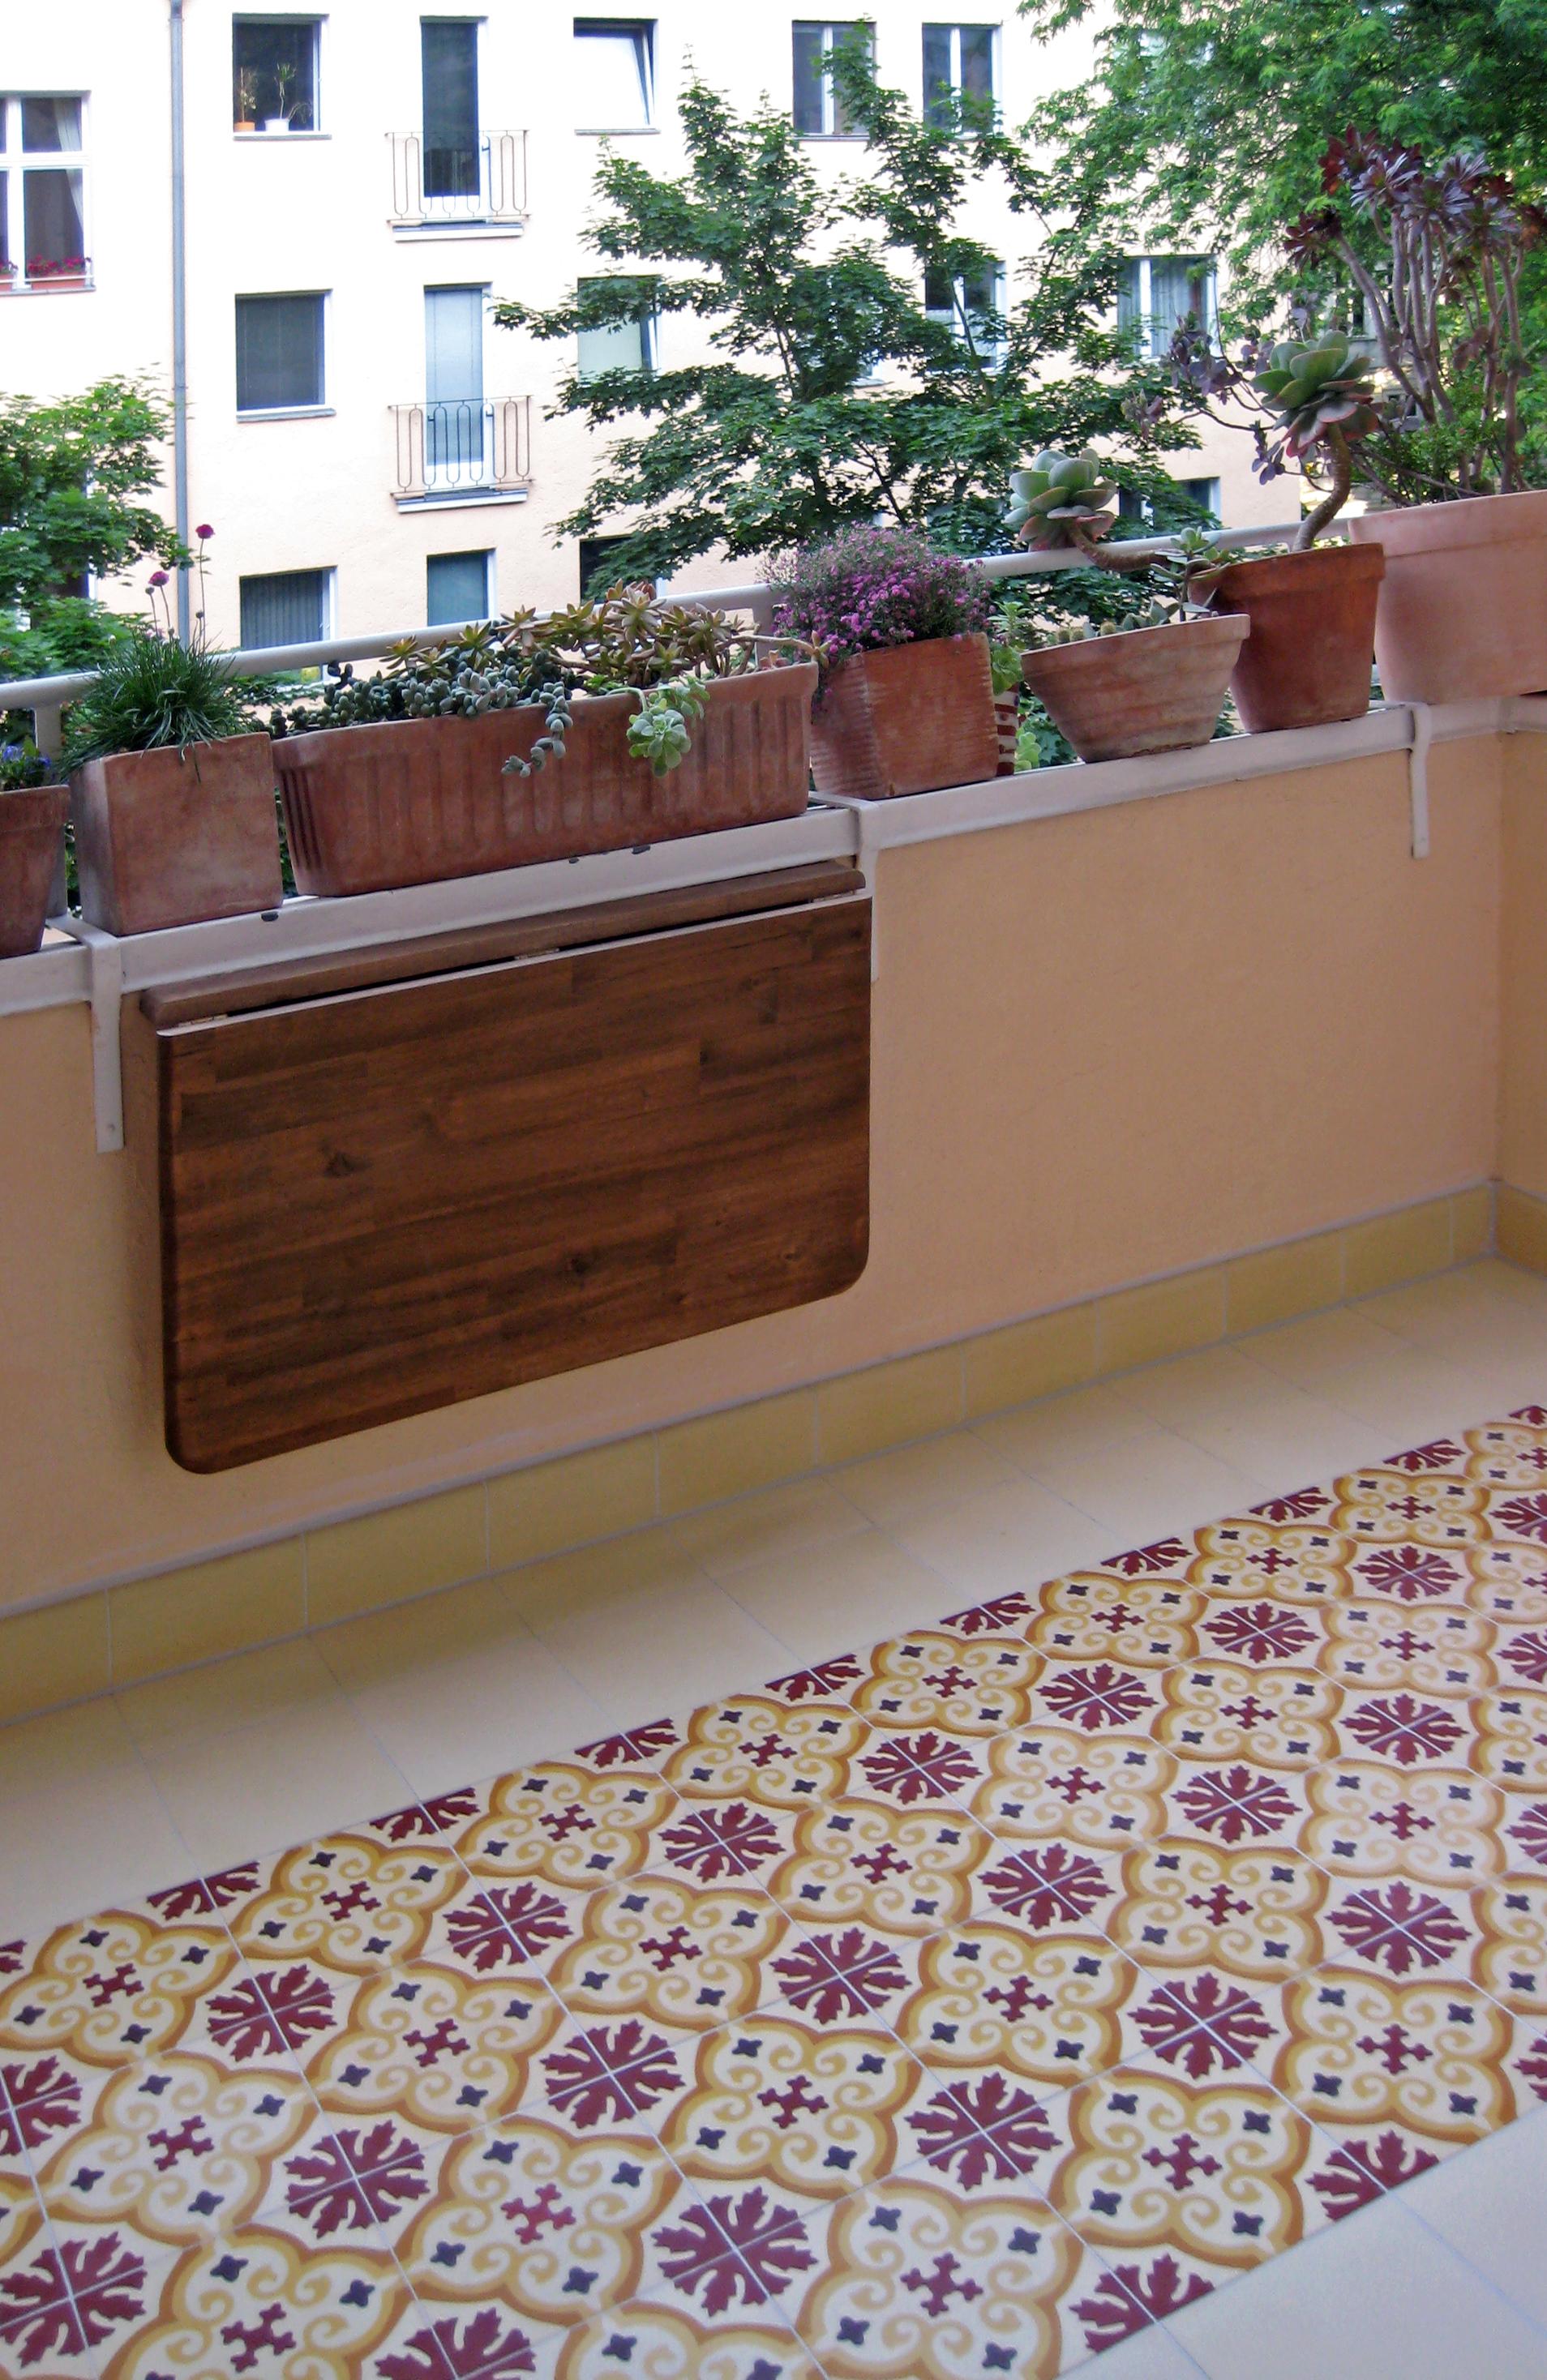 Bodenfliesen balkon - Bodenfliesen balkon kunststoff ...